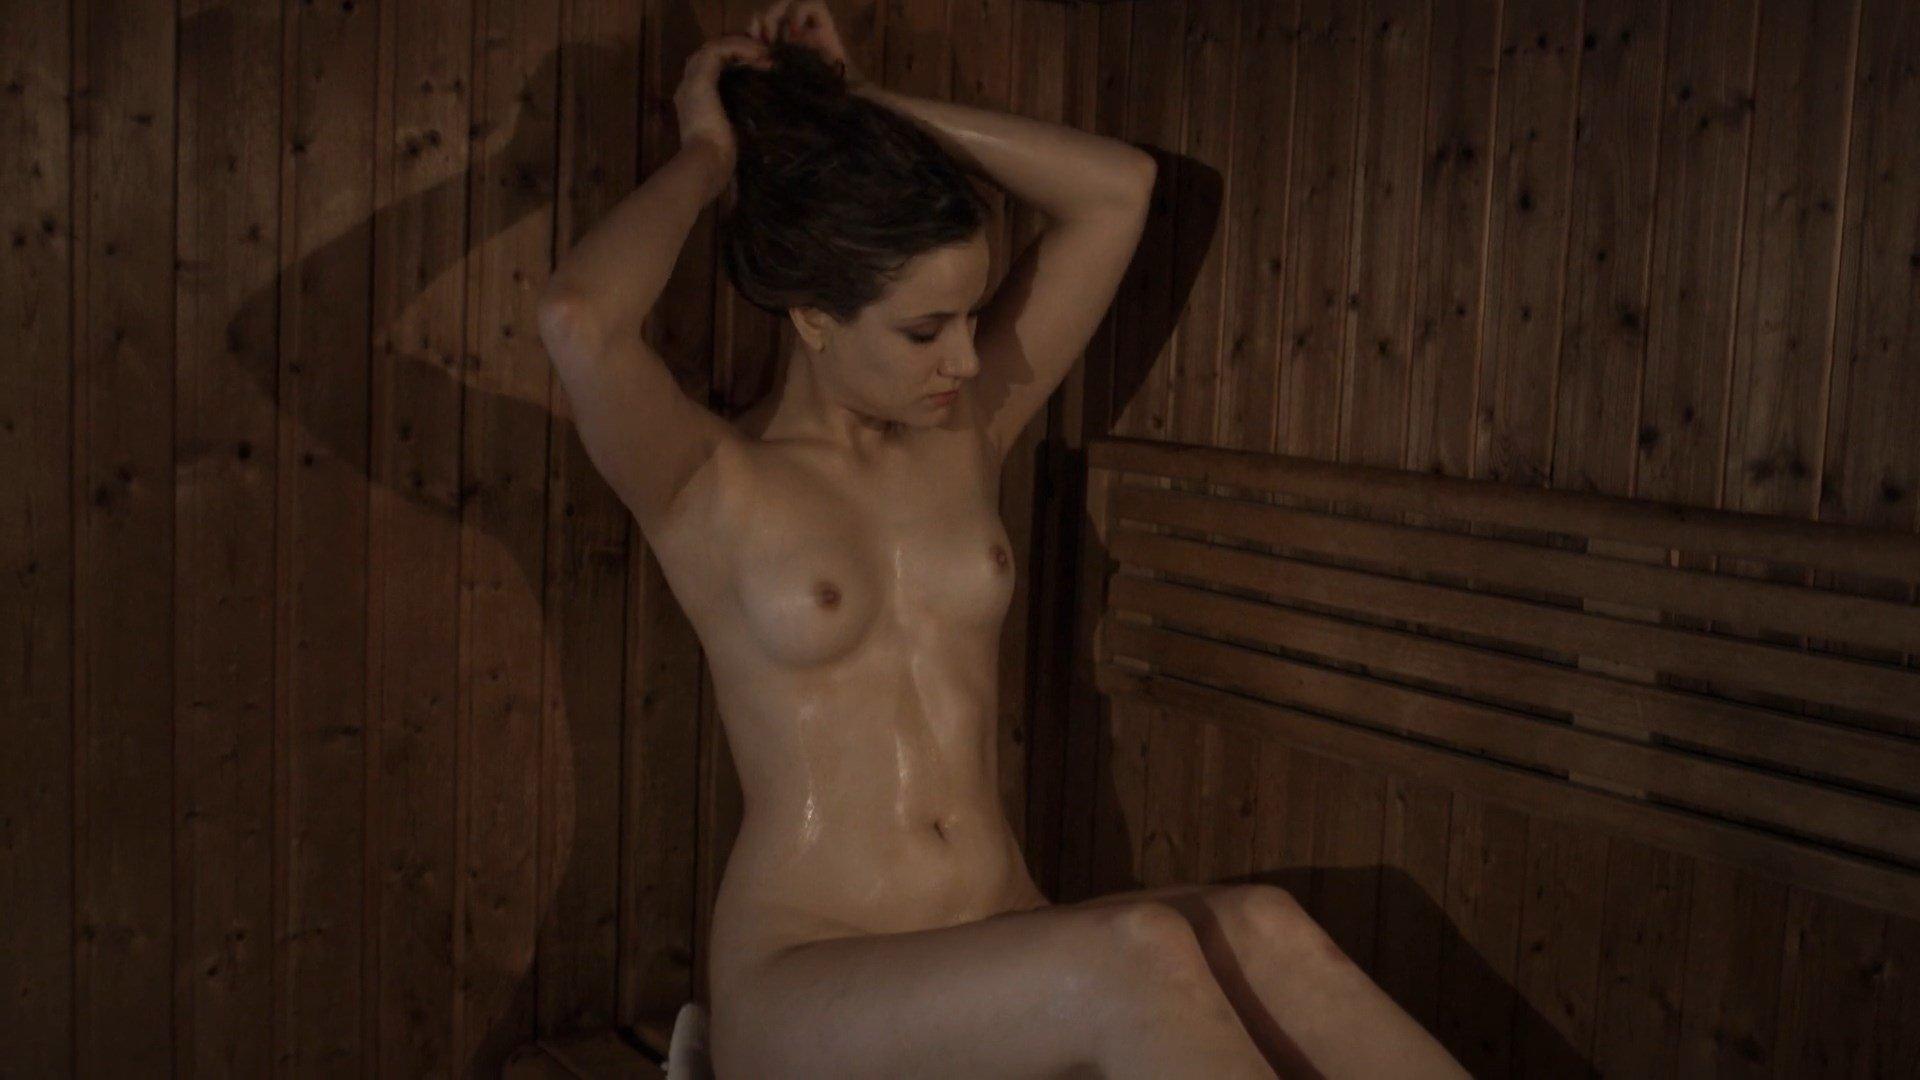 Melina Hess nude, Fiona-Maria Karagiannidou nude - Fikkefuchs (2017)